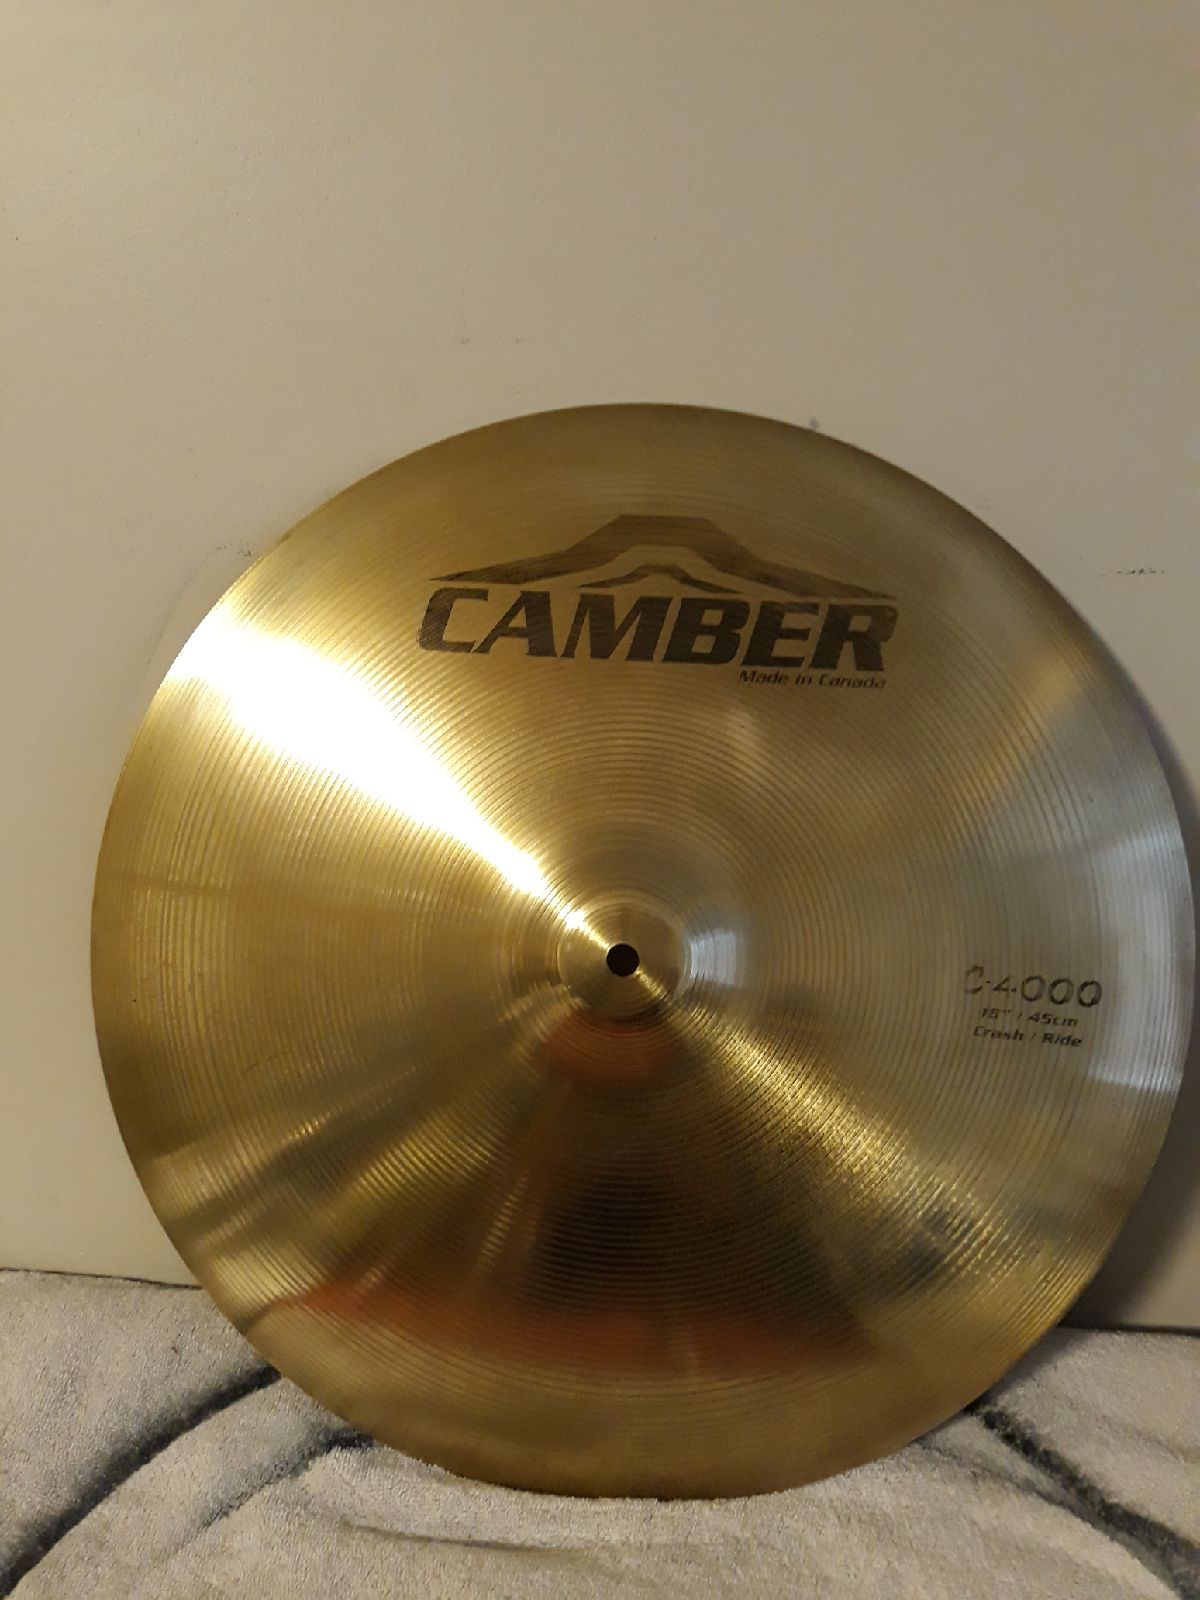 18 inch crash cymbal